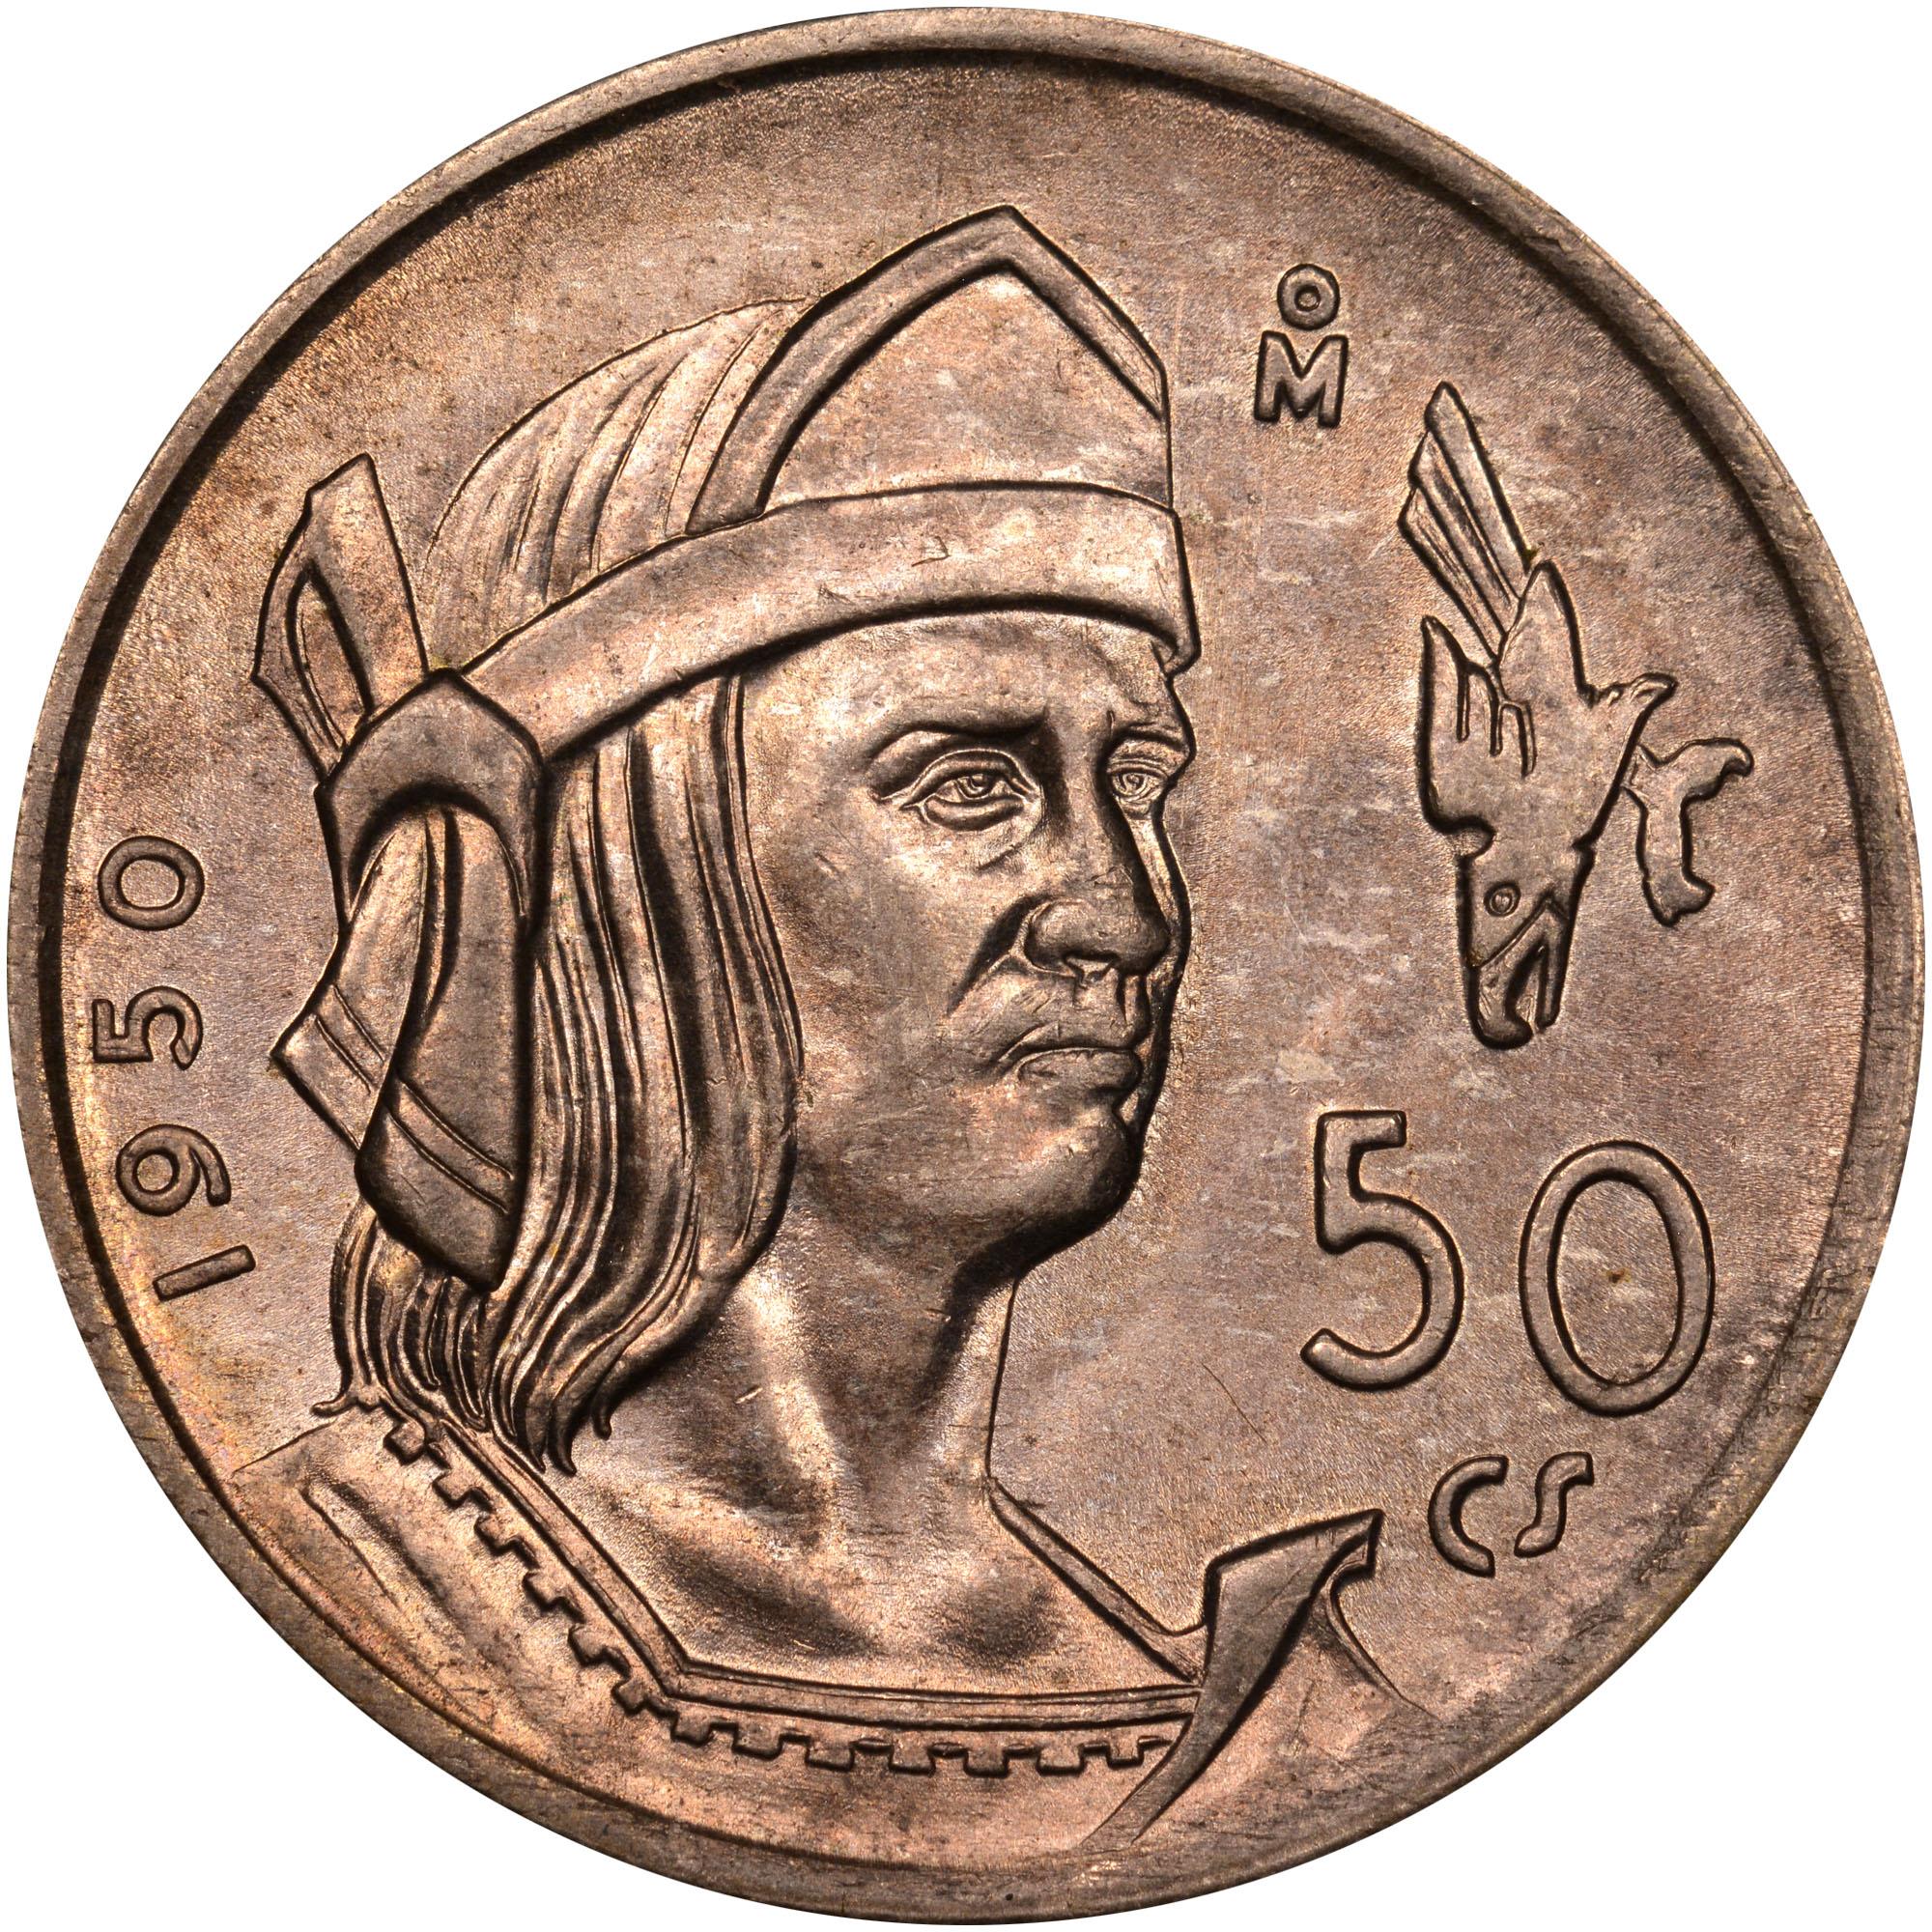 1950-1951 Mexico 50 Centavos reverse